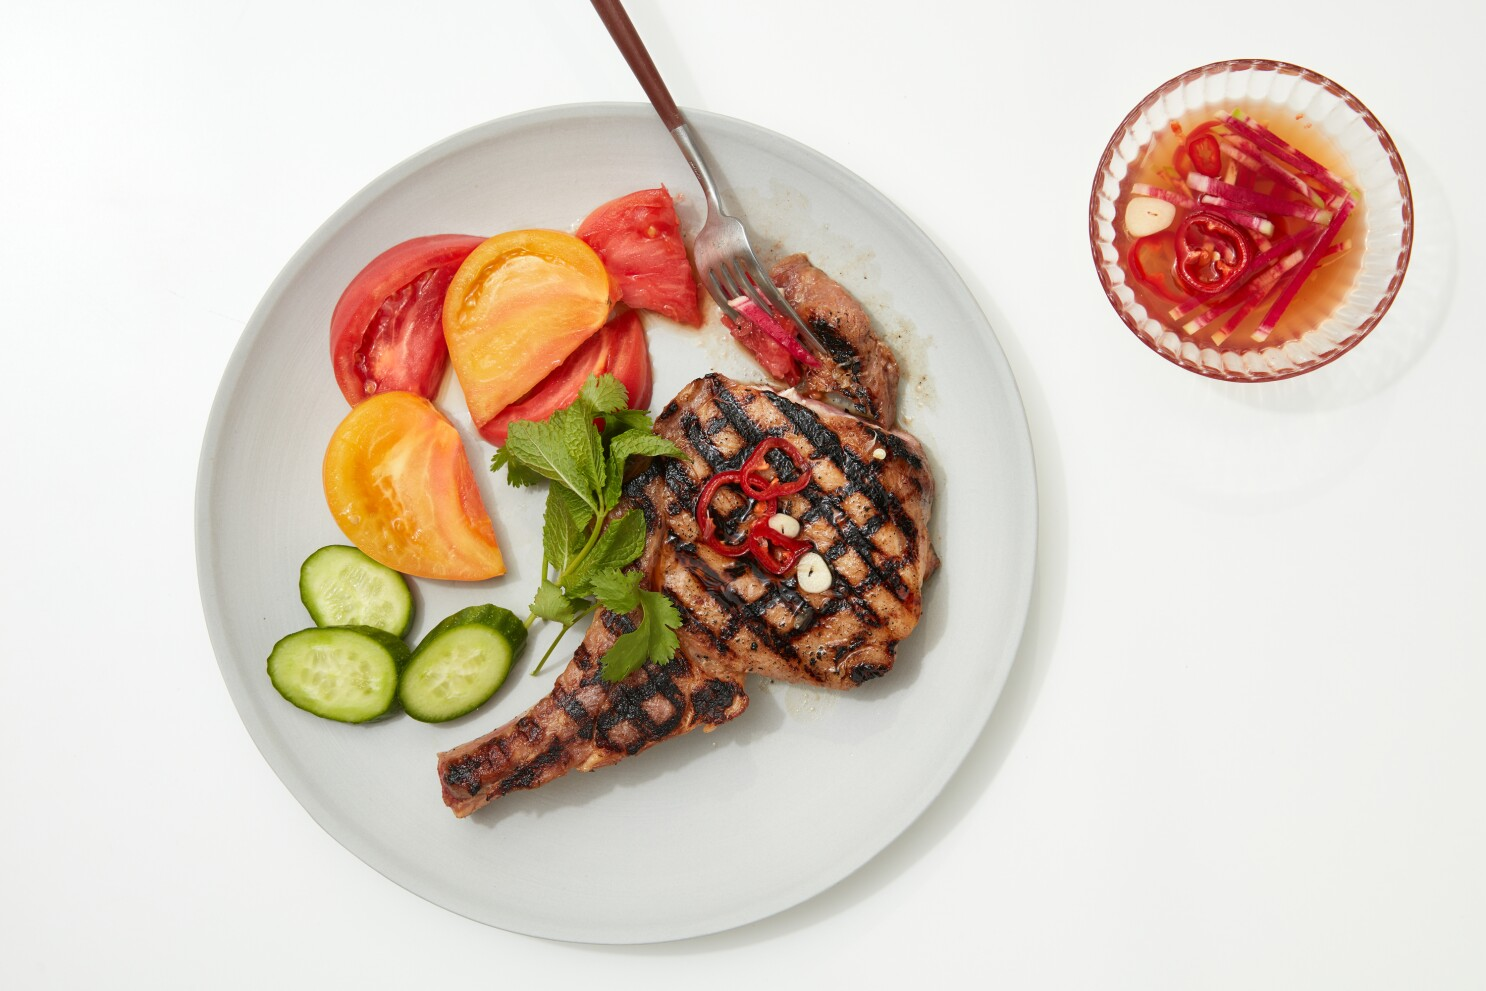 Vietnamese grilled pork chops with watermelon radish nuoc cham